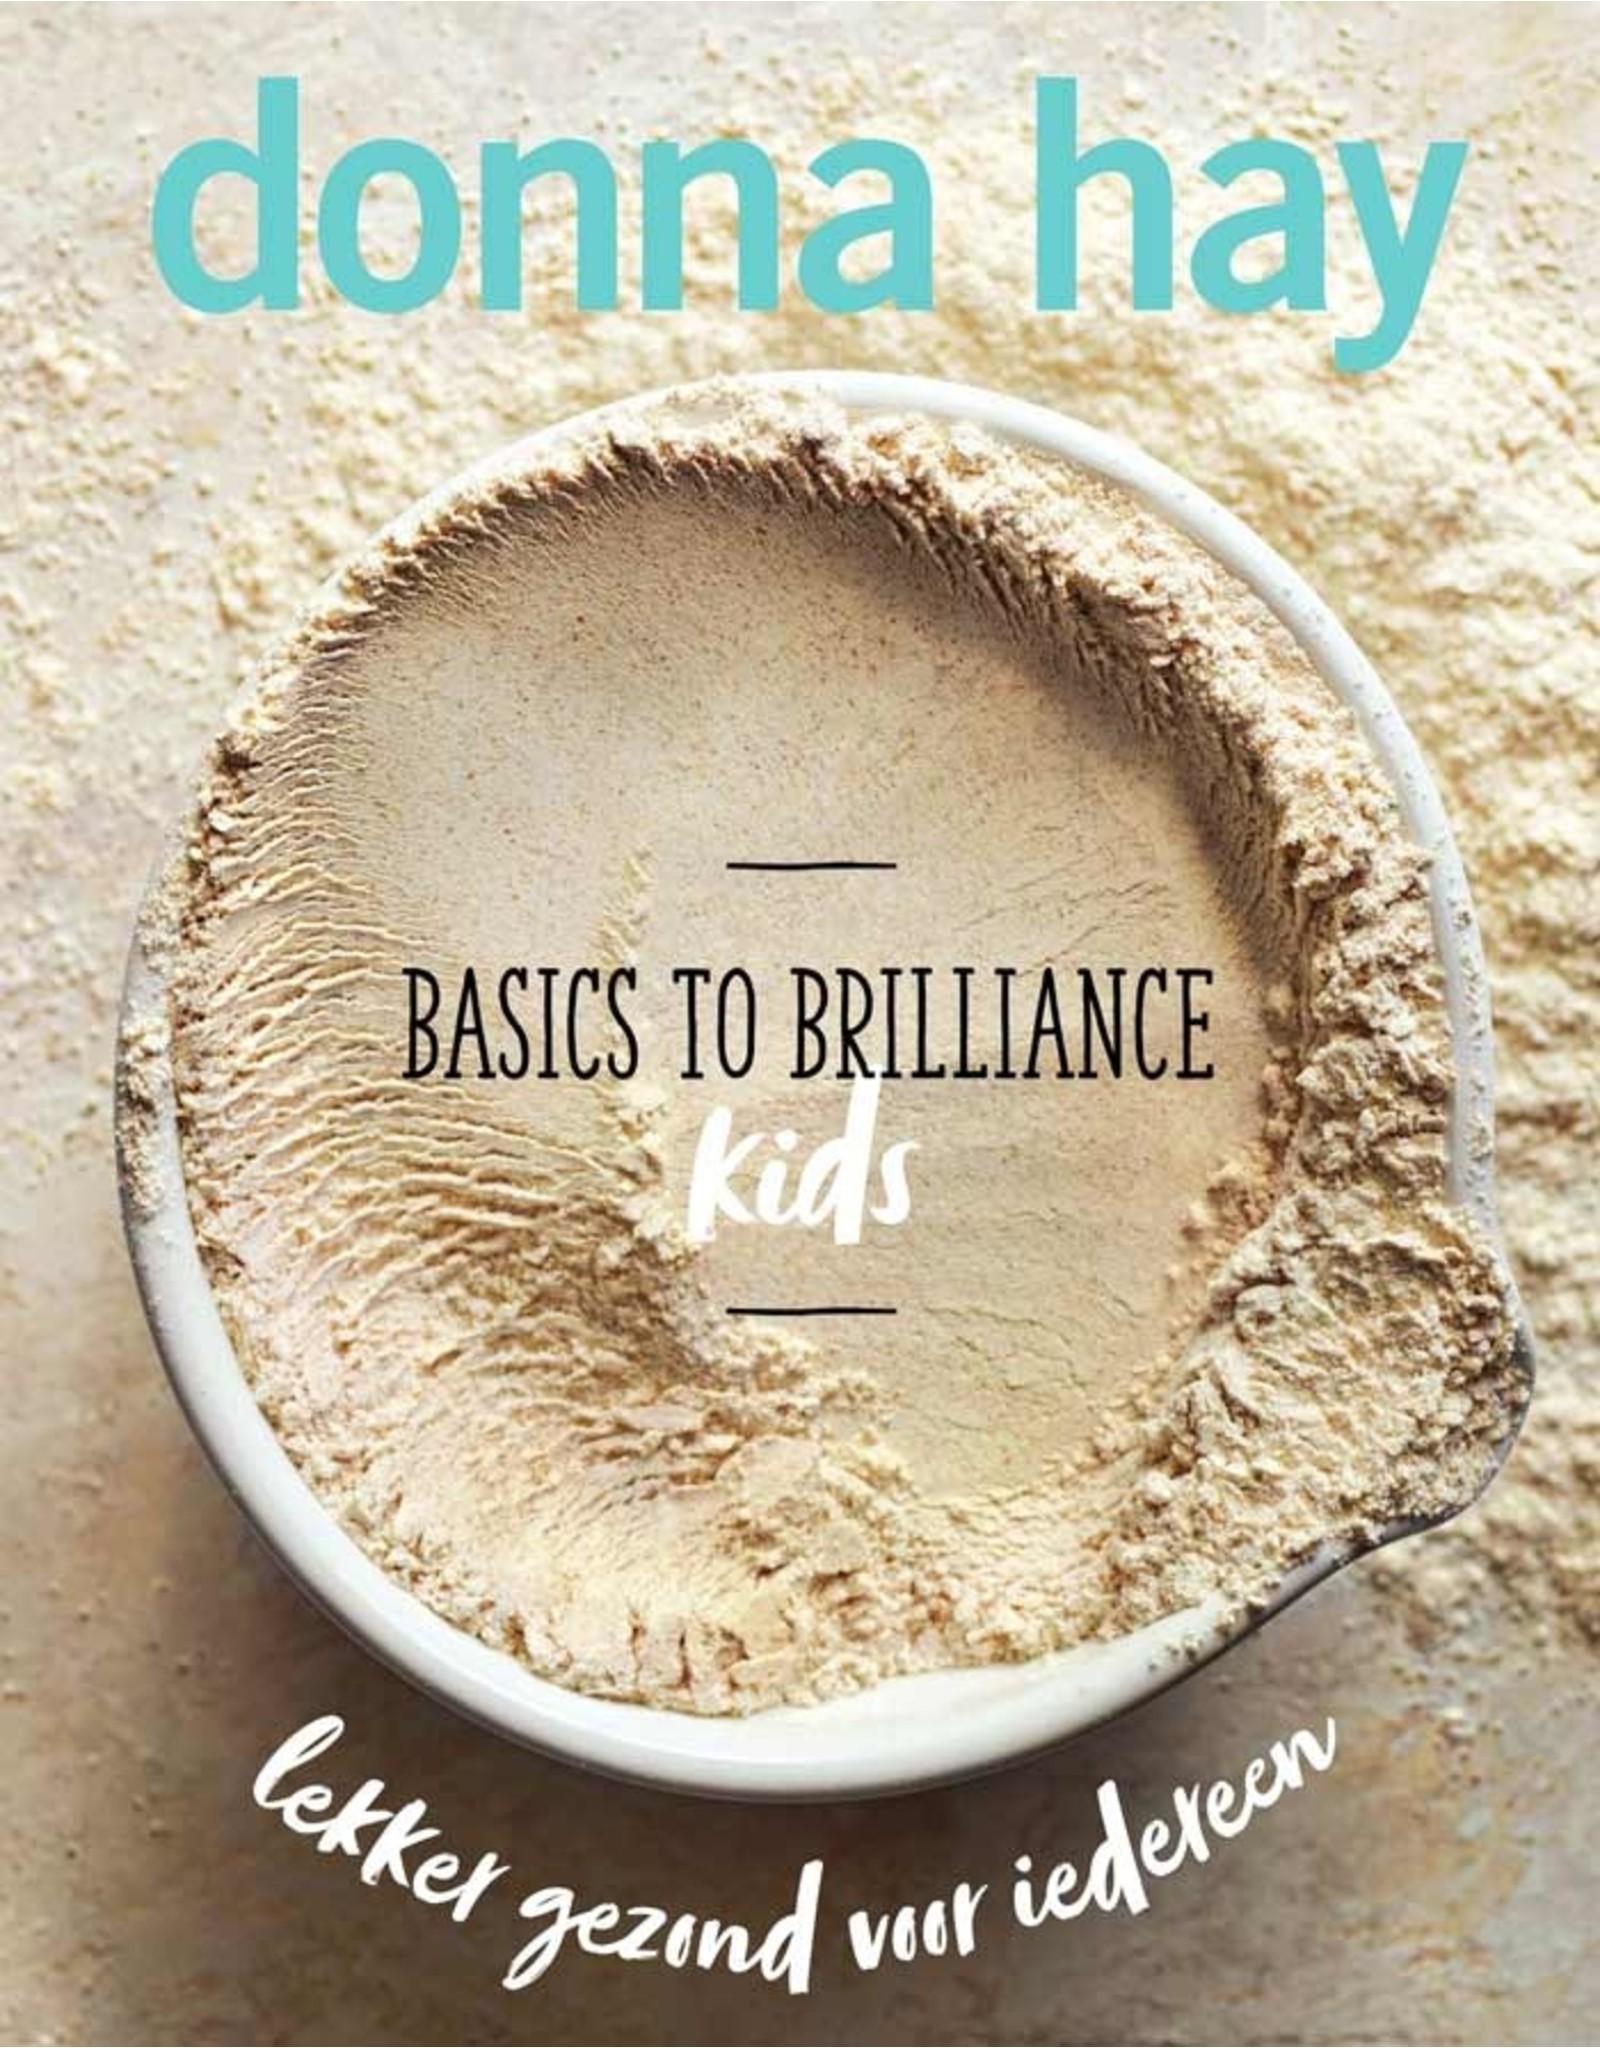 Donna Hay - Basics to Brilliance - Kids